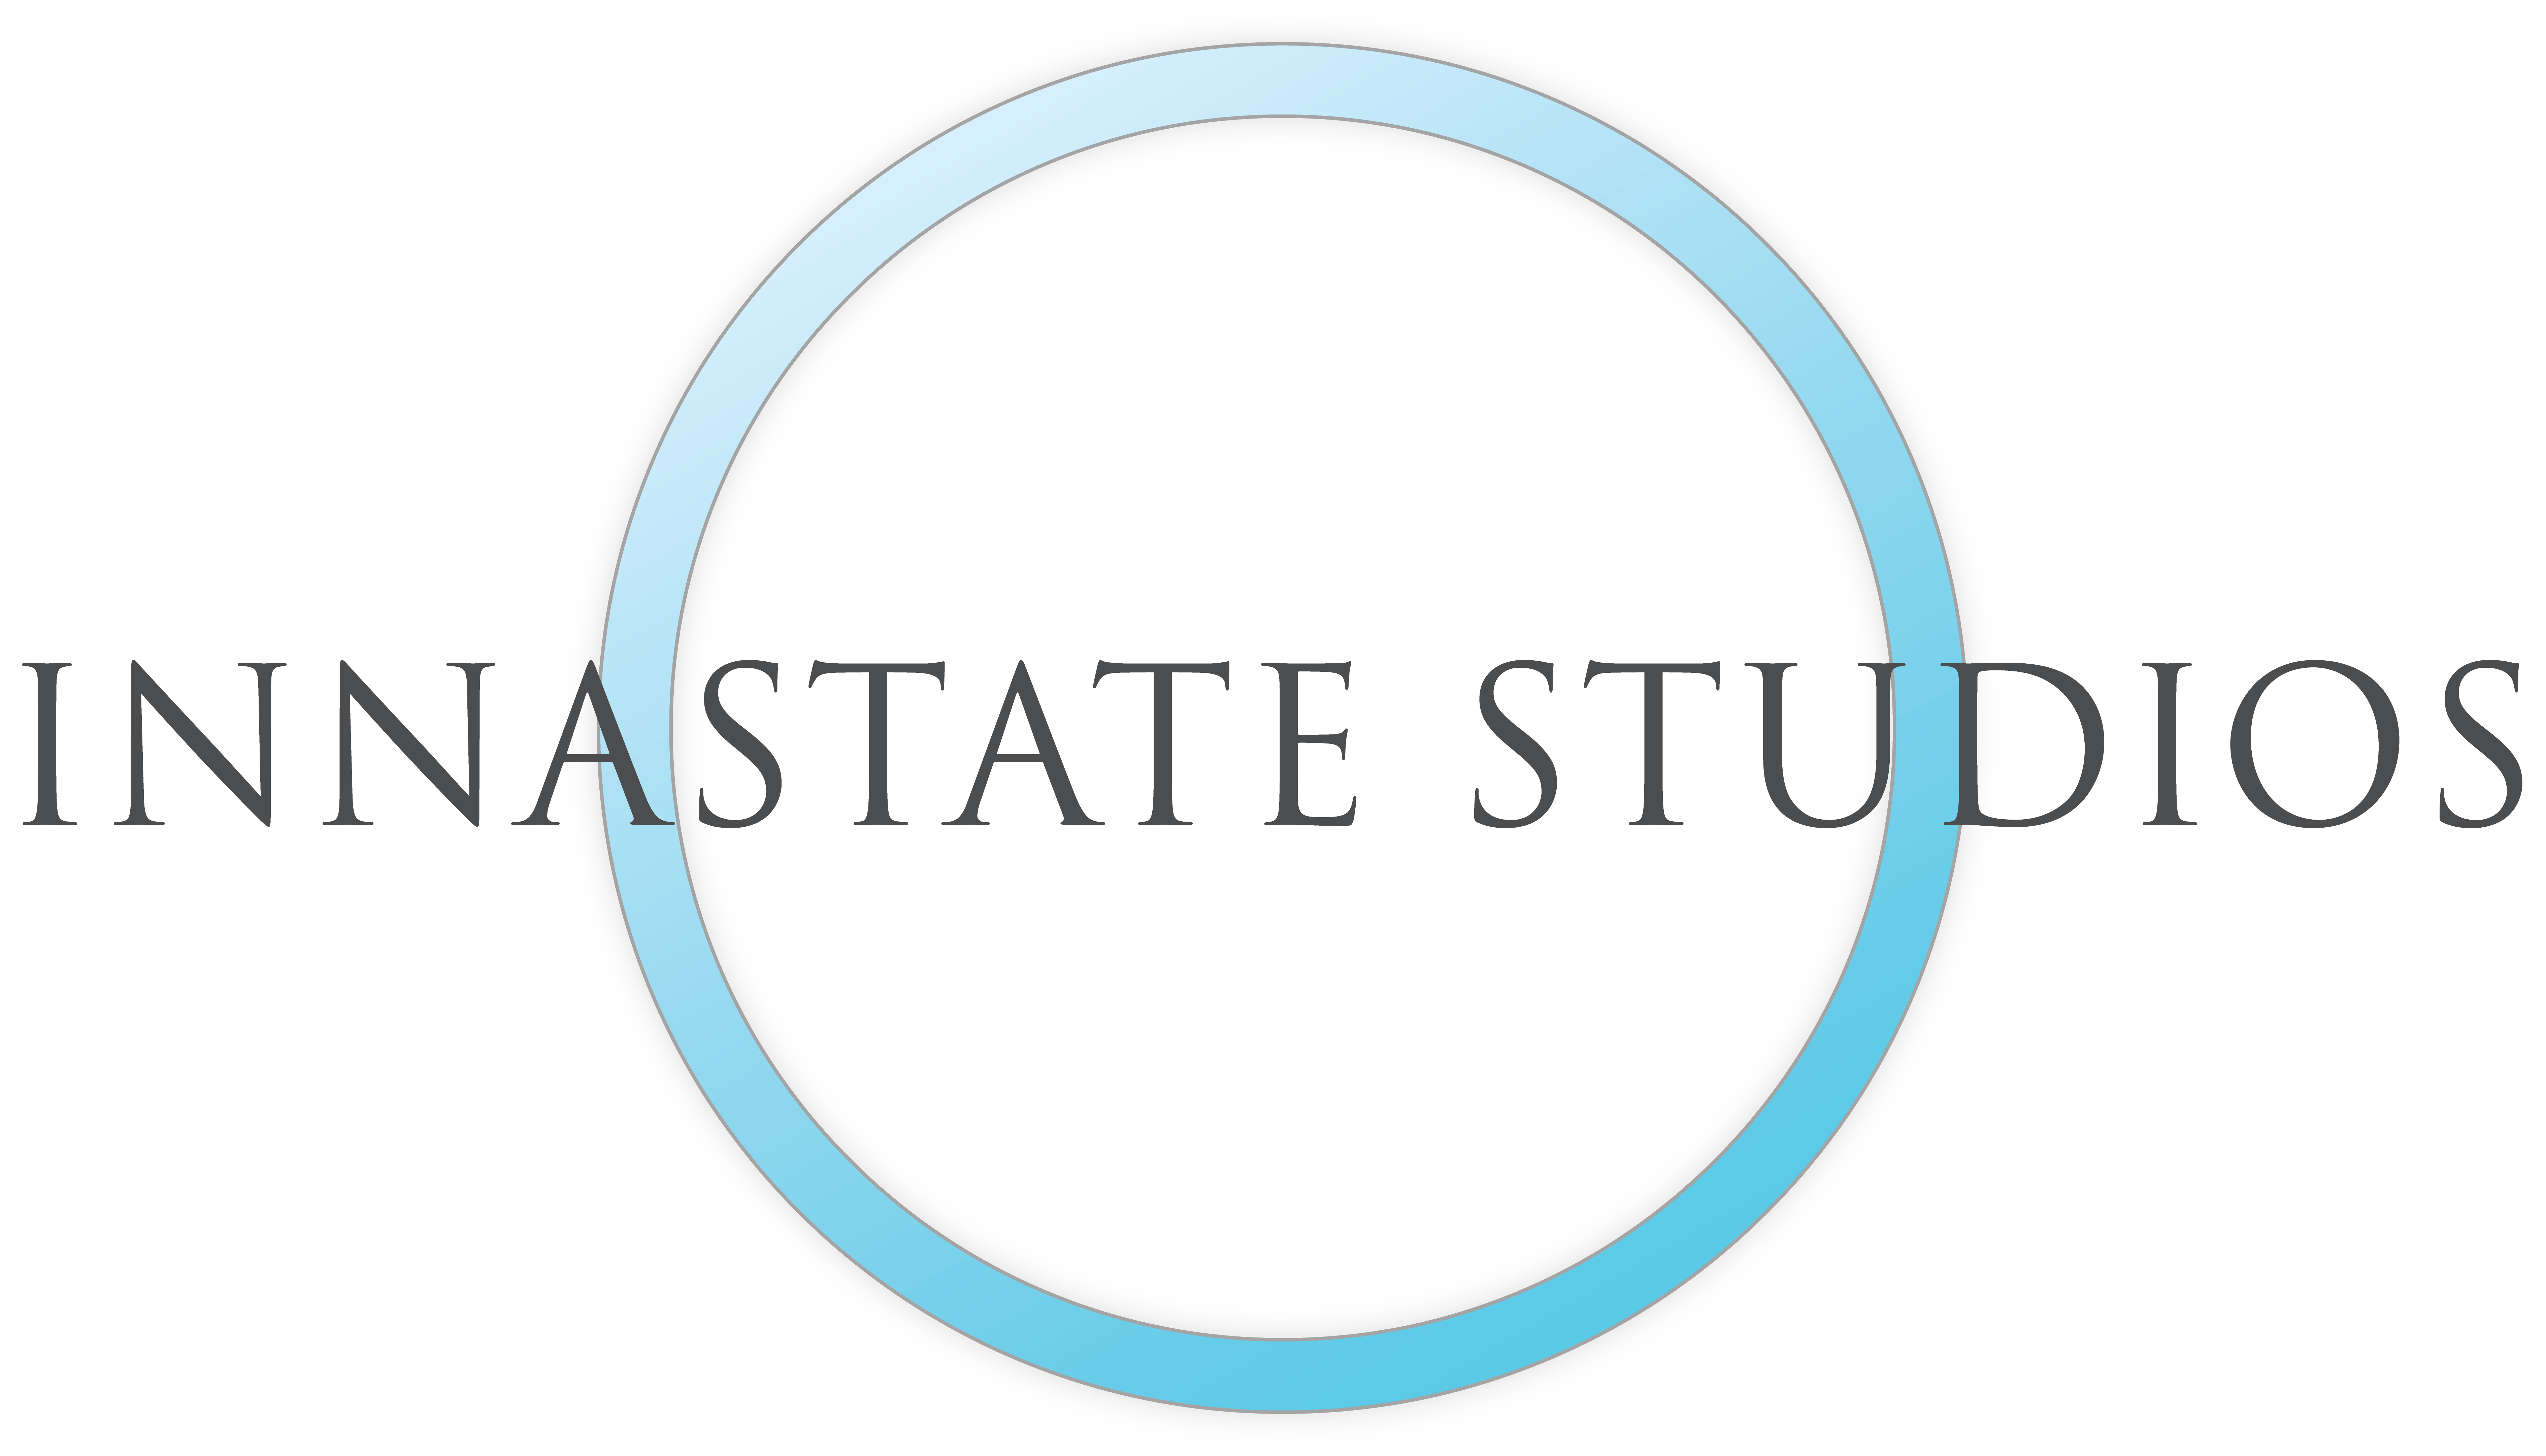 Innastate Studios